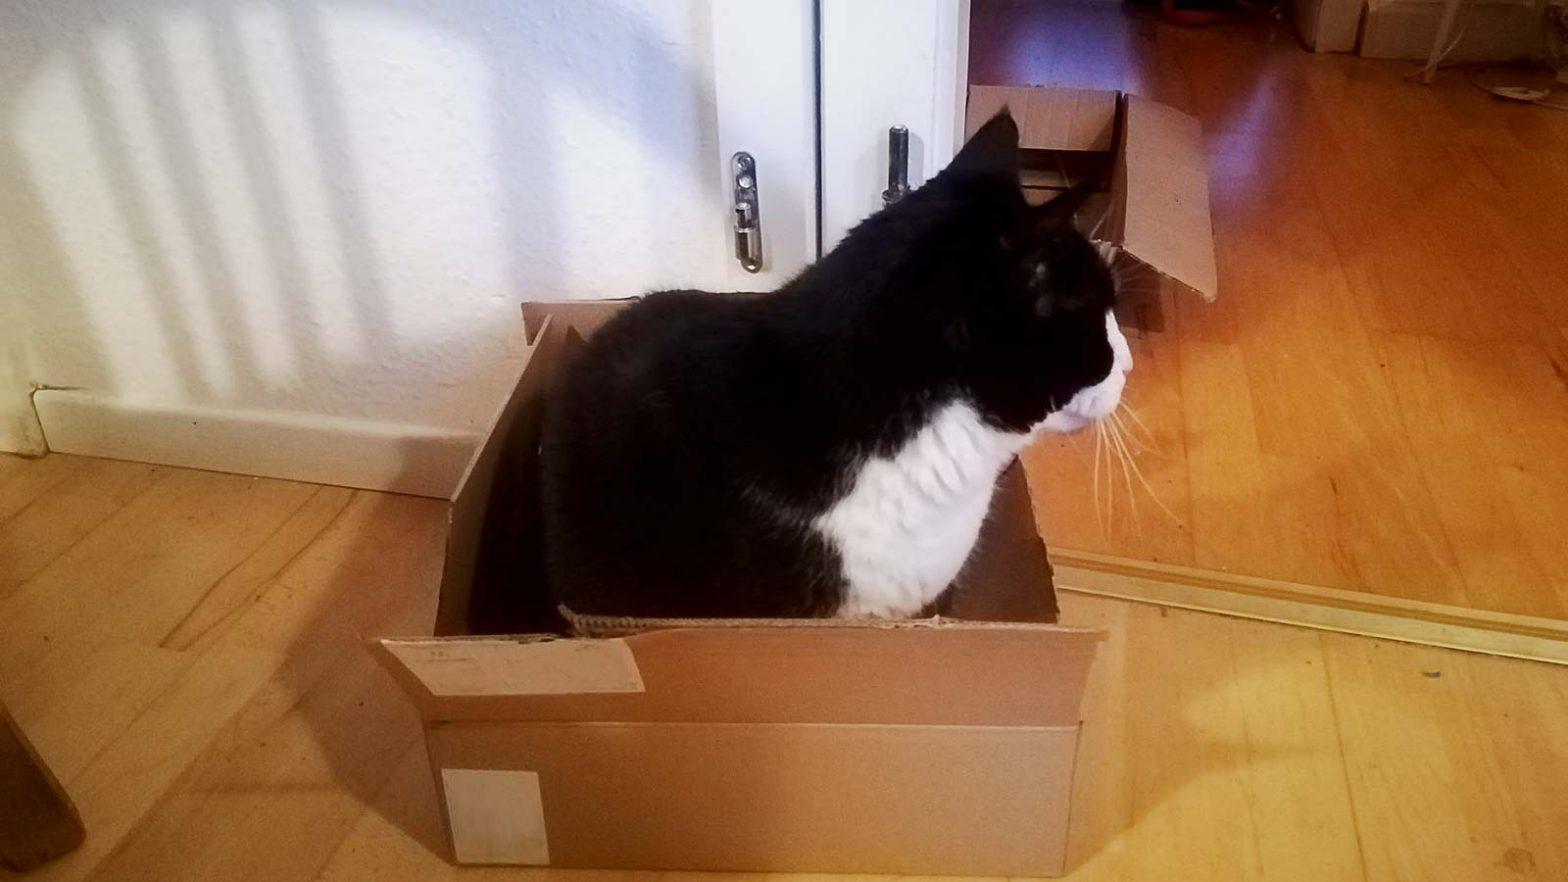 Katzen lieben Kartons. In diesem Fall Kater Cobi. foto: Romy